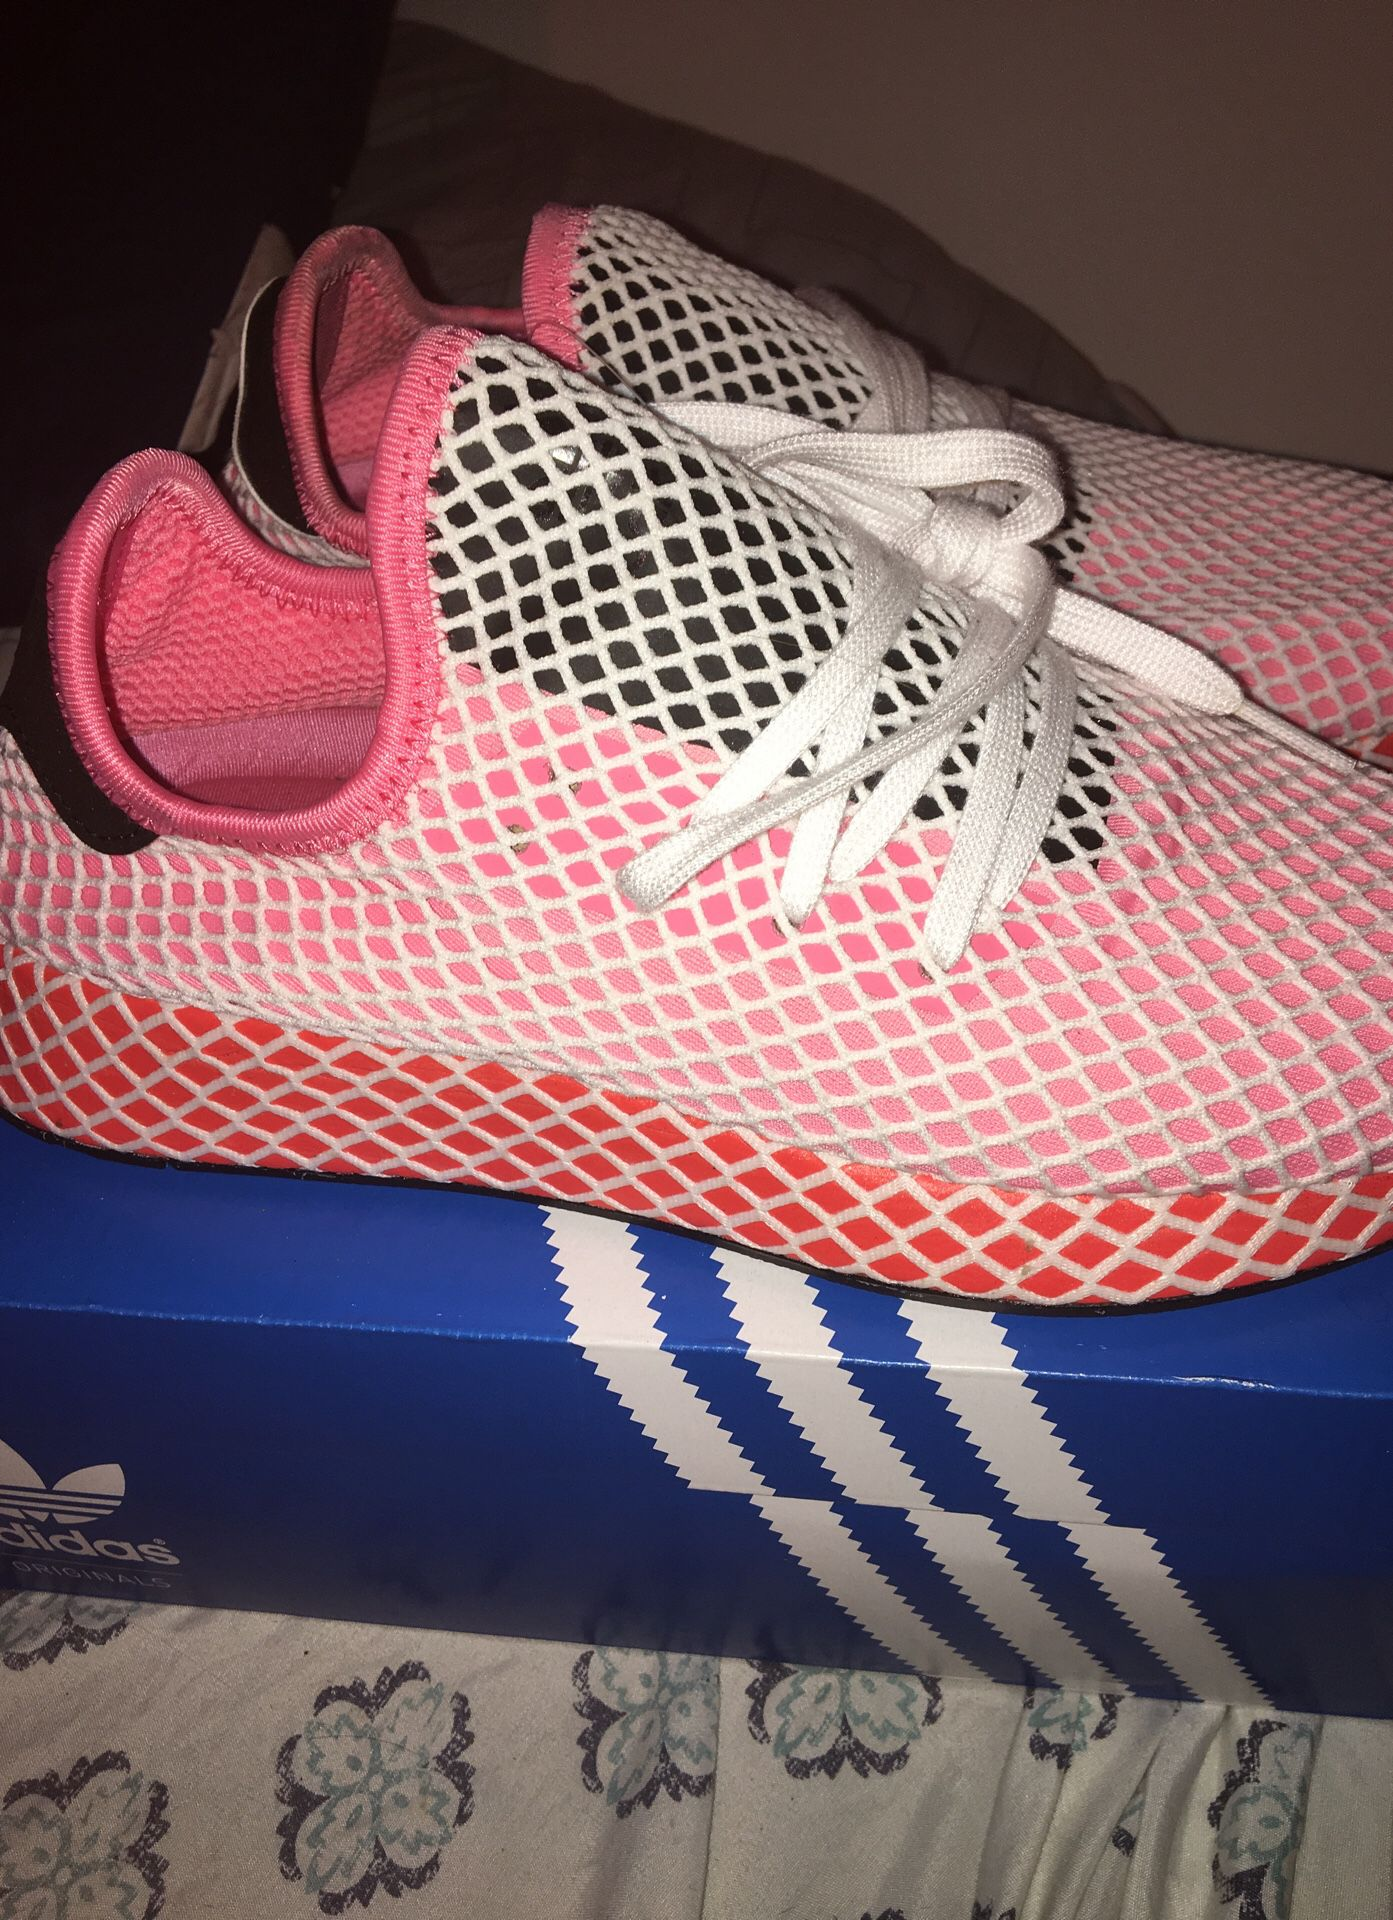 Adidas size 8 1/2 women